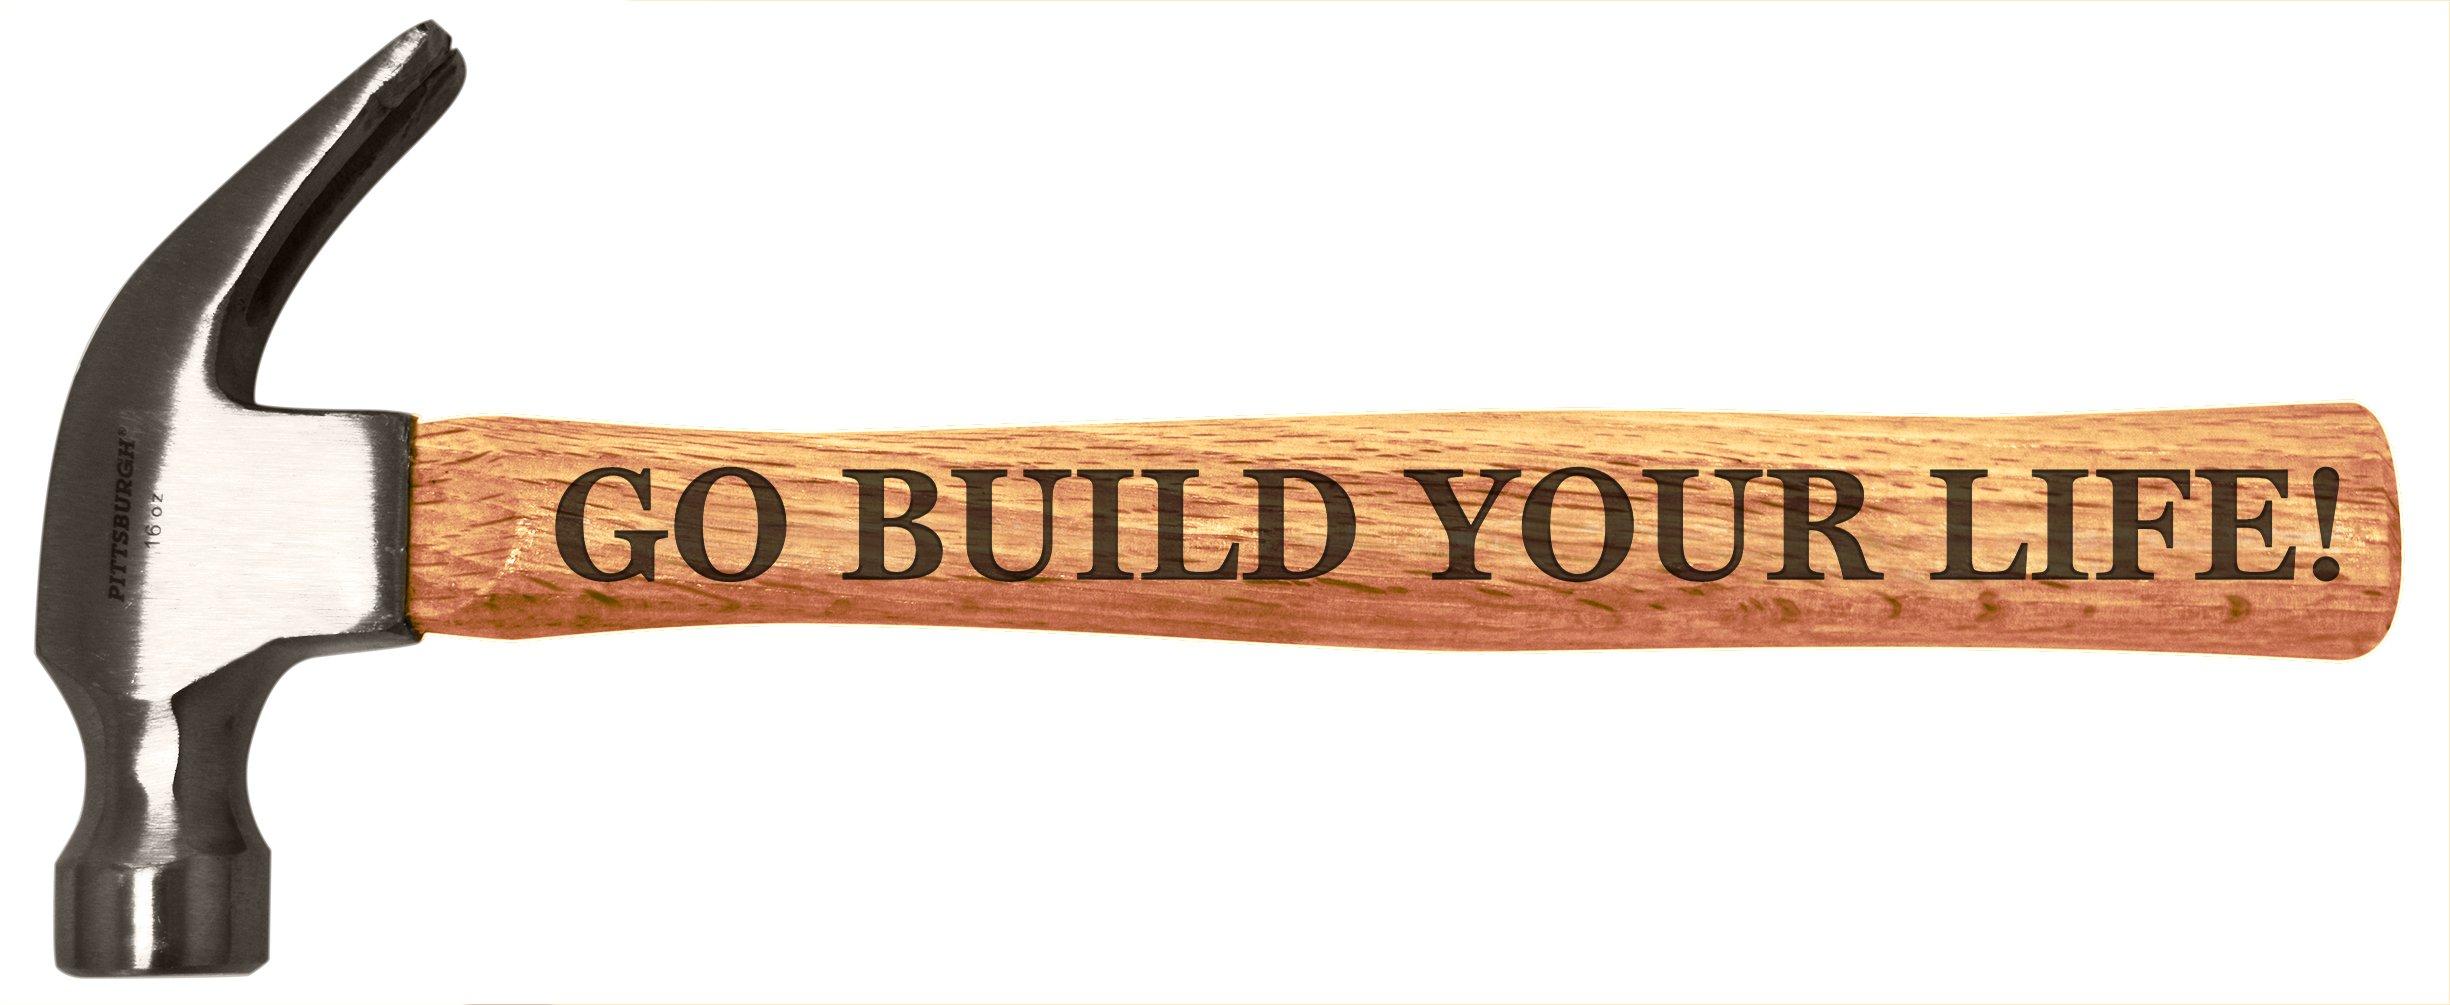 Graduation Gifts Go Build Your Life Inspirational Graduation Grad Engraved Wood Handle Steel Hammer